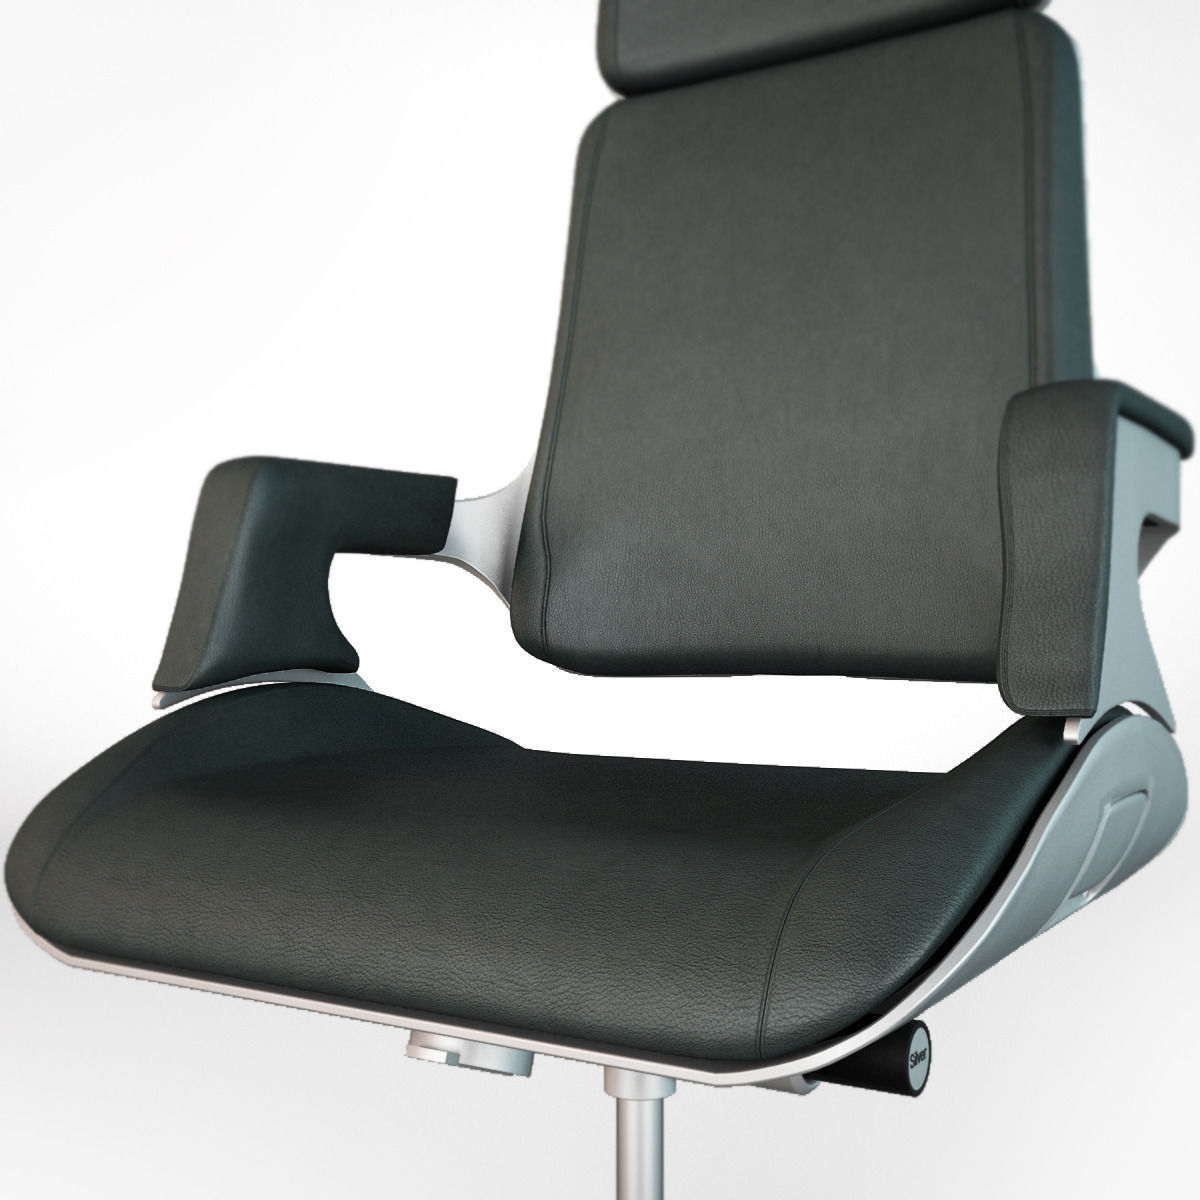 interstuhl silver 362s office chair 3d model max obj. Black Bedroom Furniture Sets. Home Design Ideas